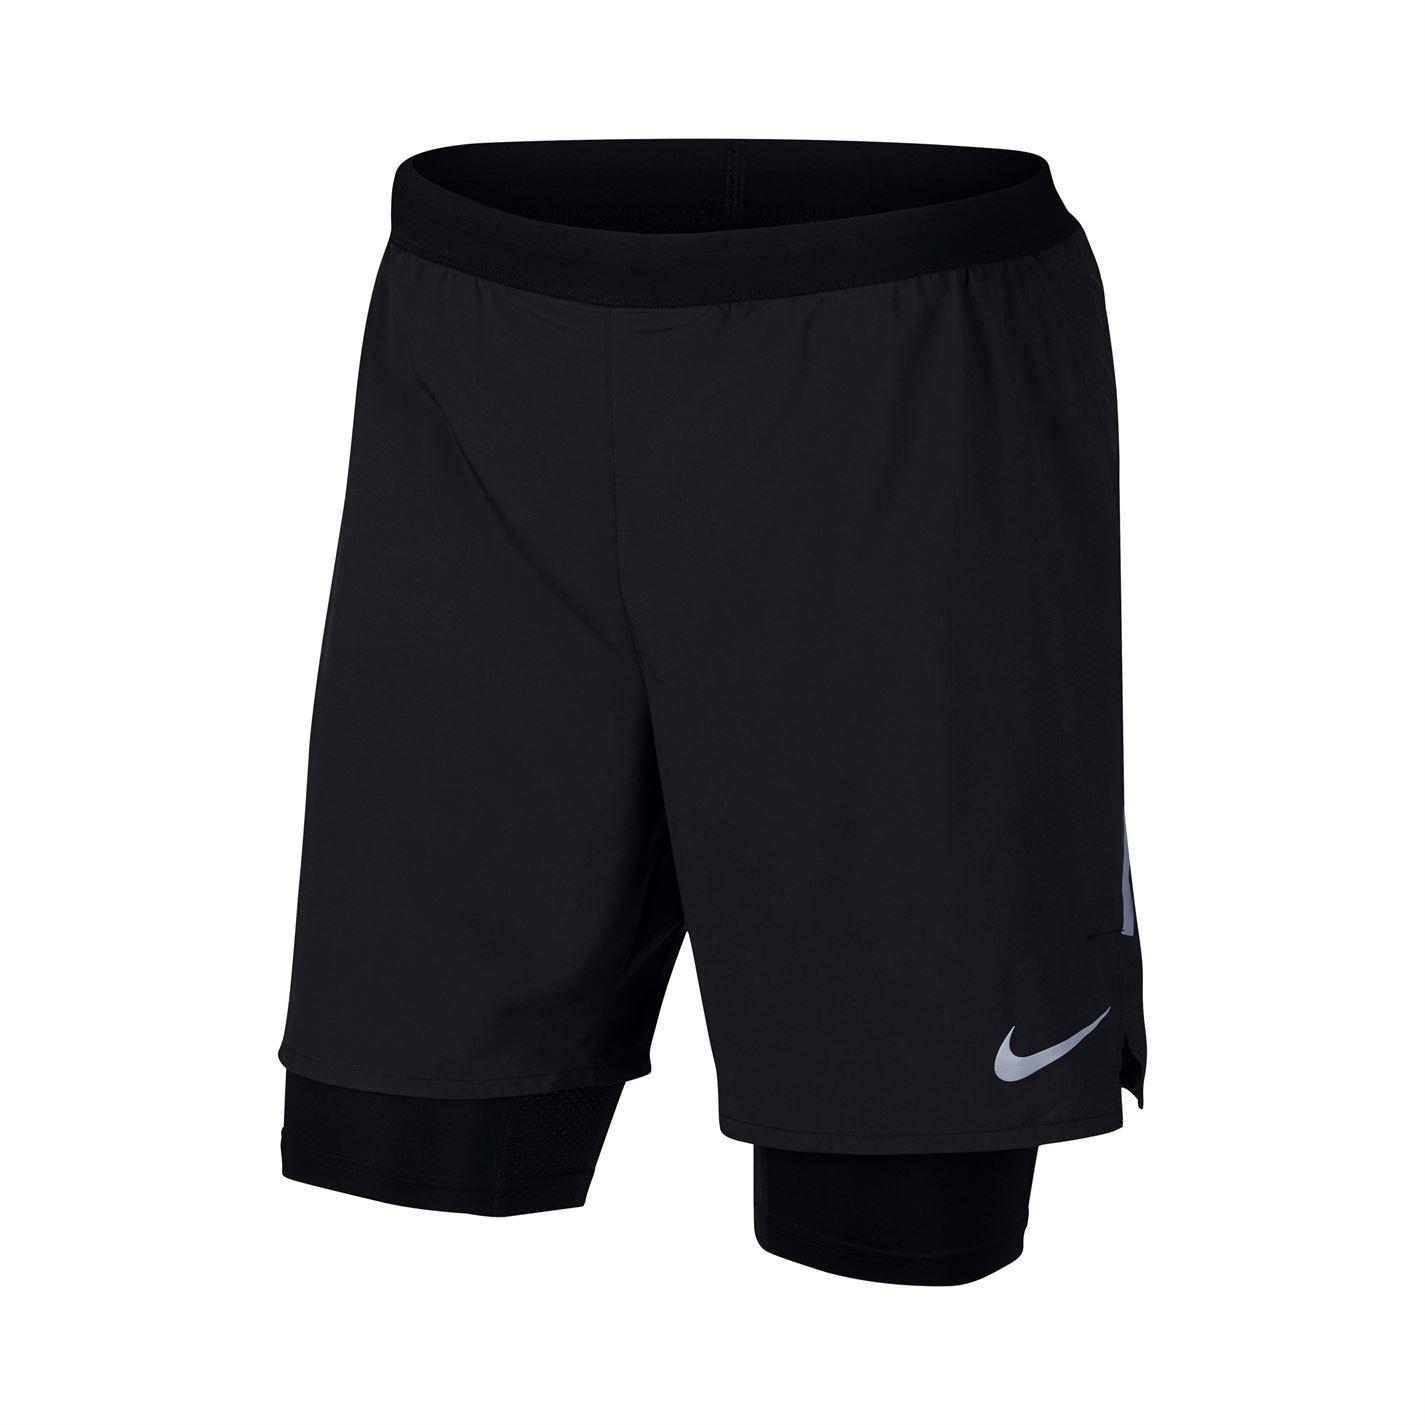 Nike Flex Stride 2 in 1 Running Shorts Mens